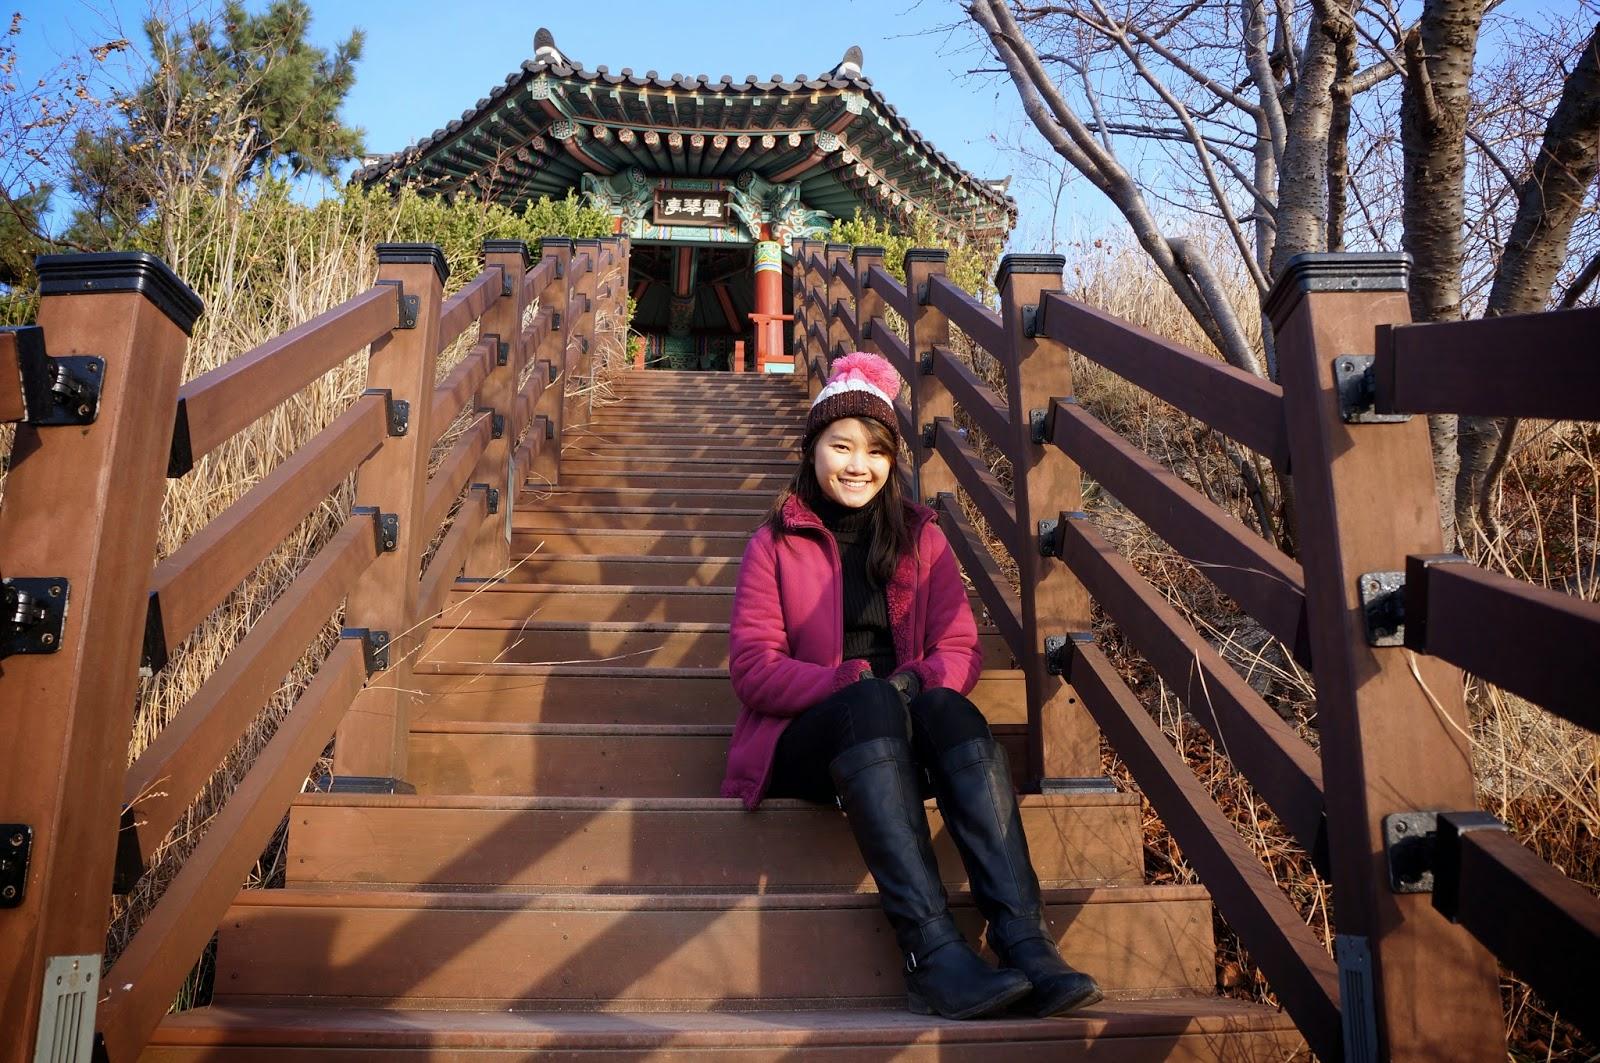 Yeonggeumjeong Pavillion